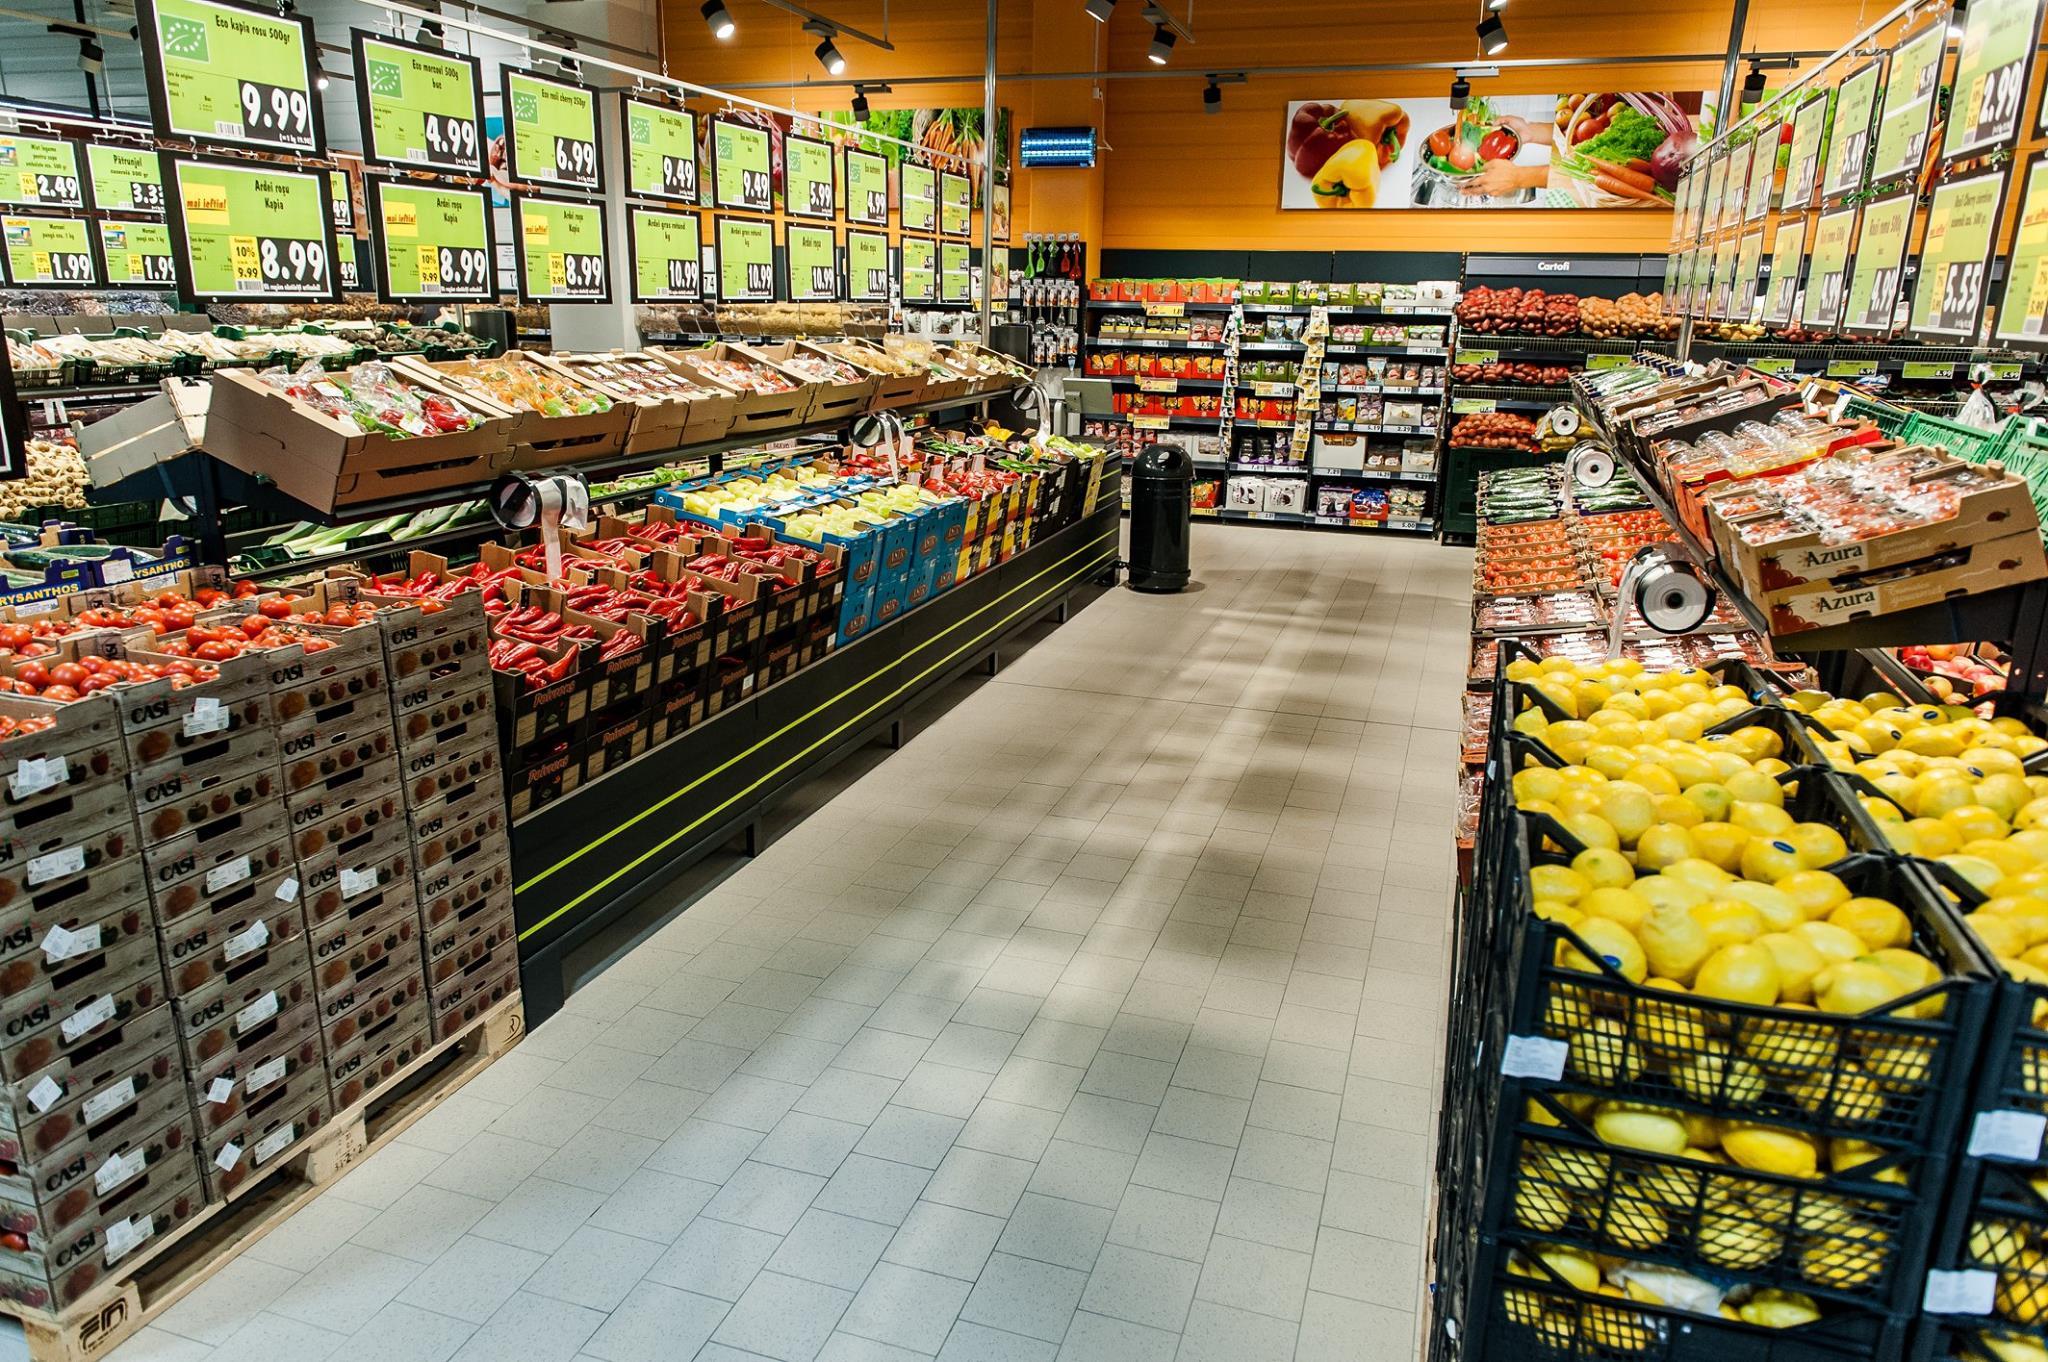 Romania's Jan-Feb retail trade turnover up 8.7% - table